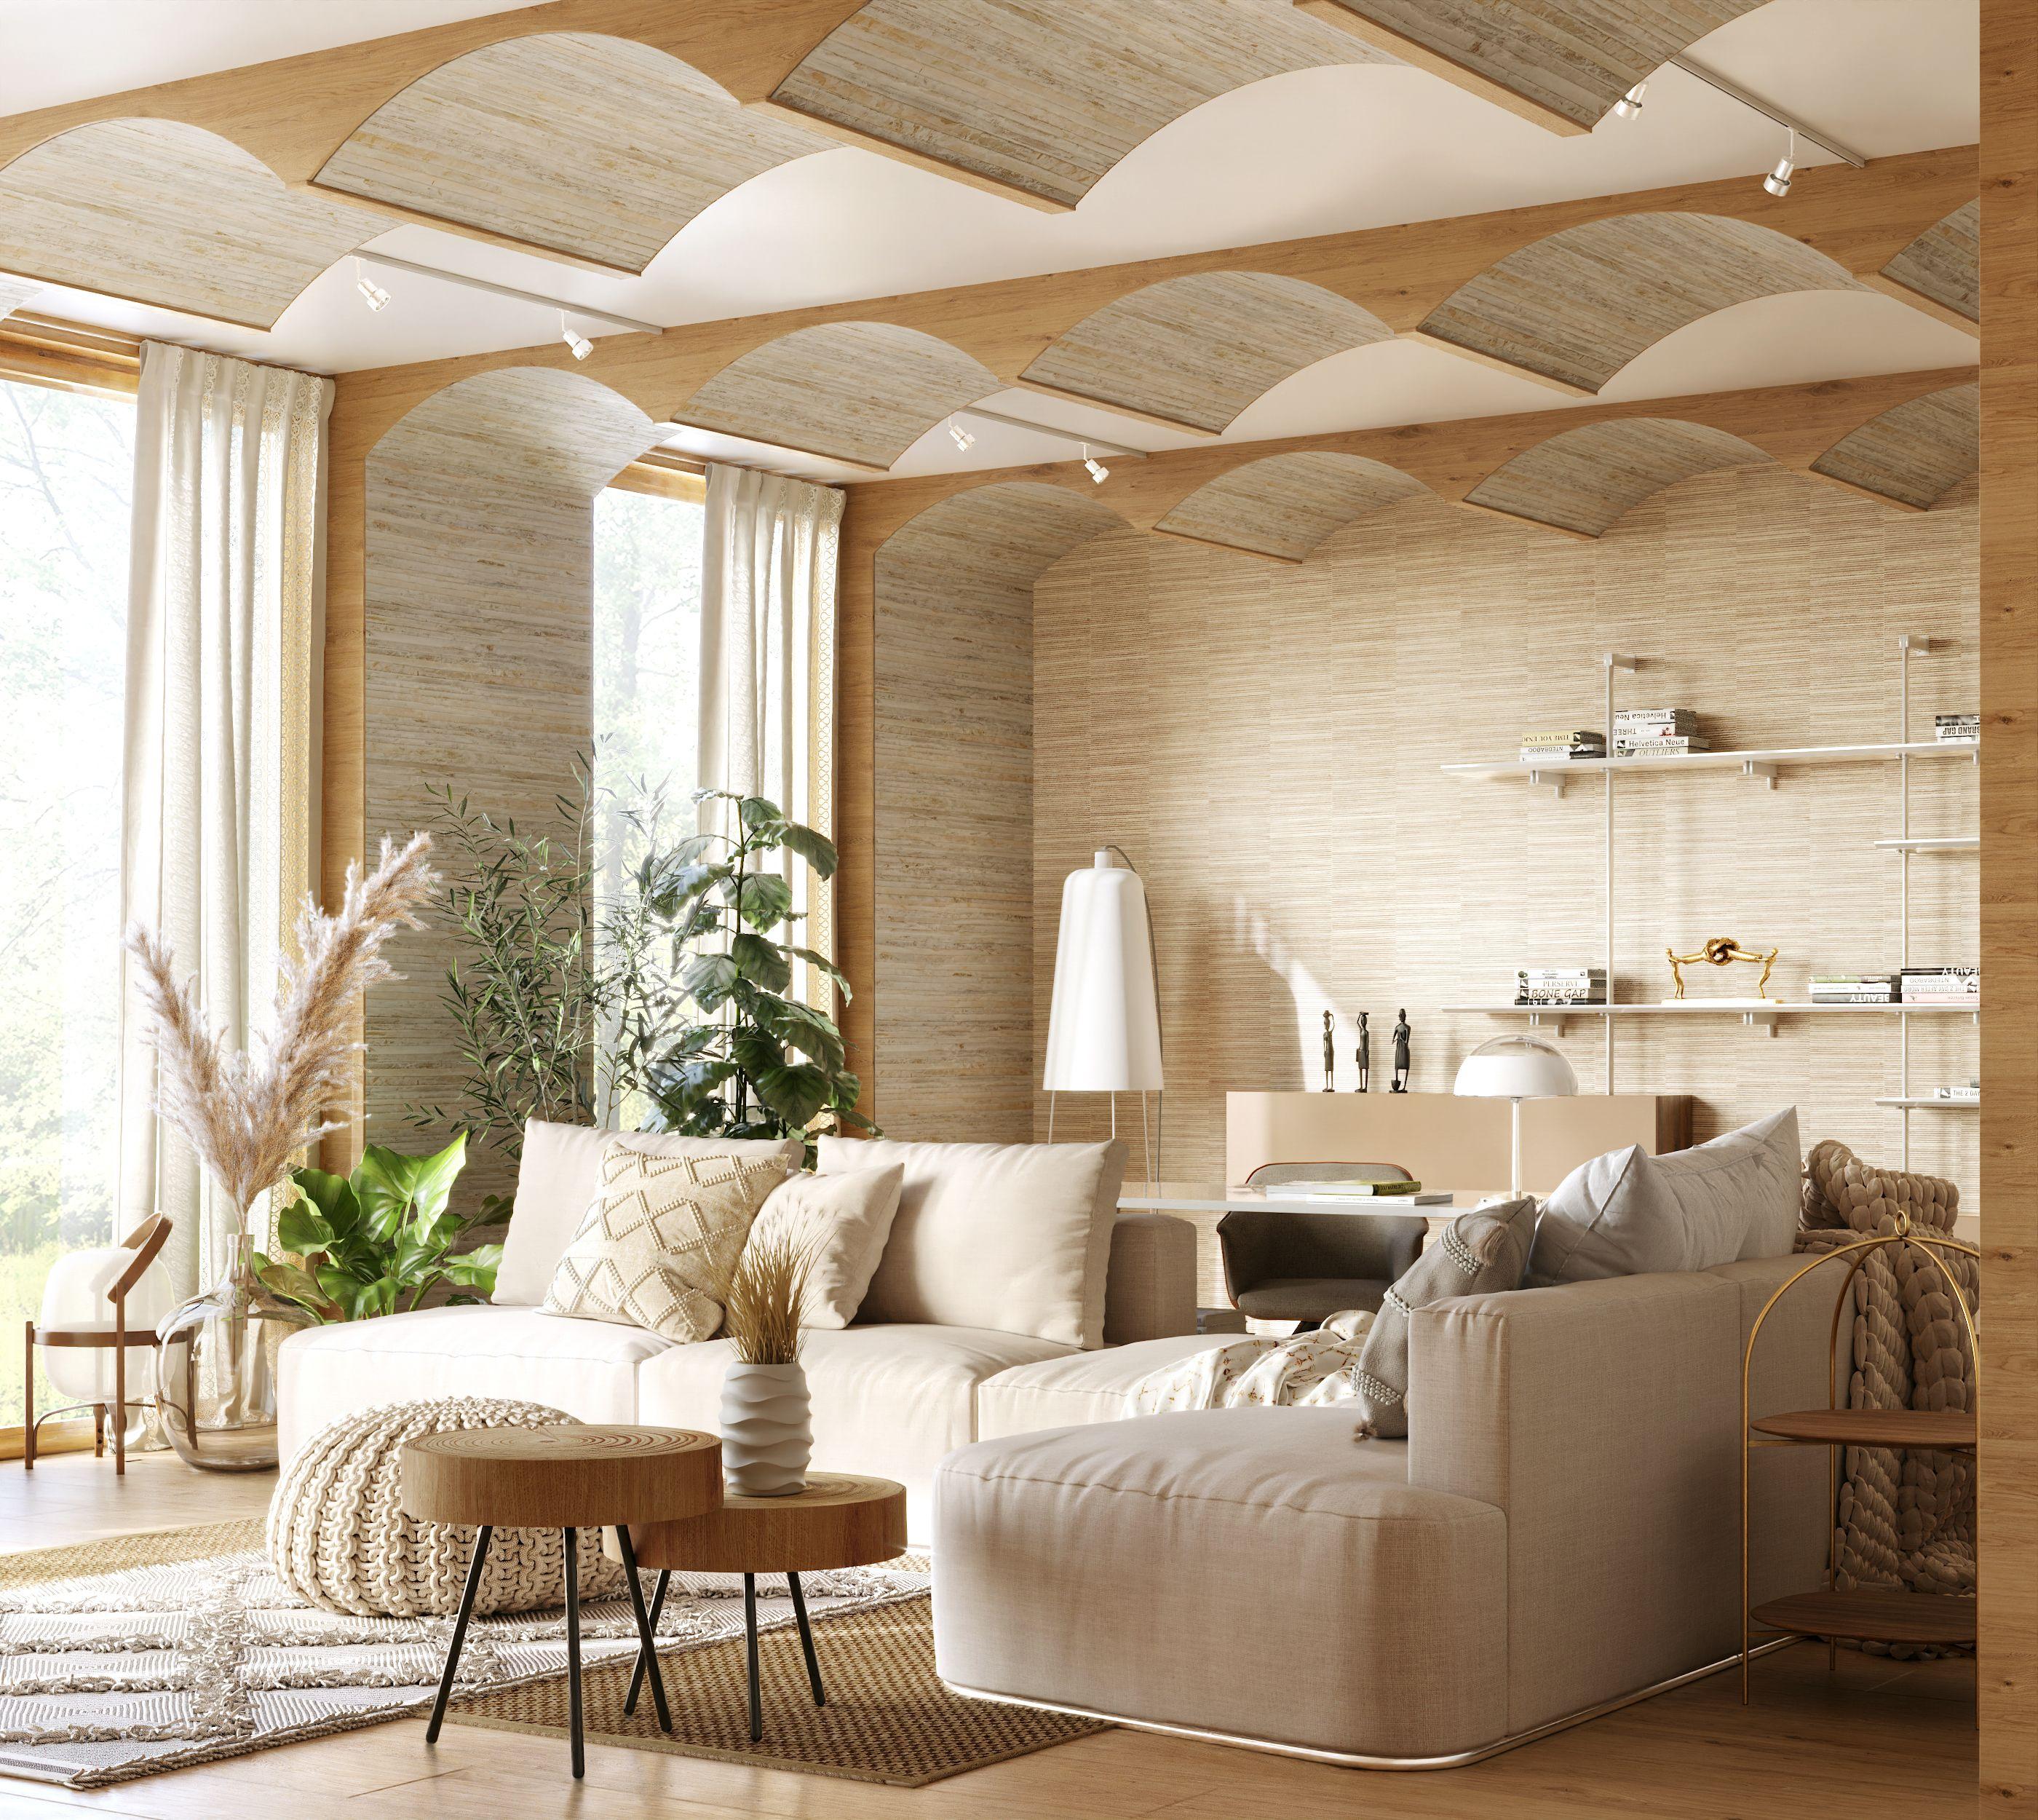 boho style living room #anastasiia_architect#decorhome#bohohome#interiorstyle#ideasforinspiration#интерьергостиной#оформлениестен#декордлядома#бохостиль#экостиль#экоинтерьер